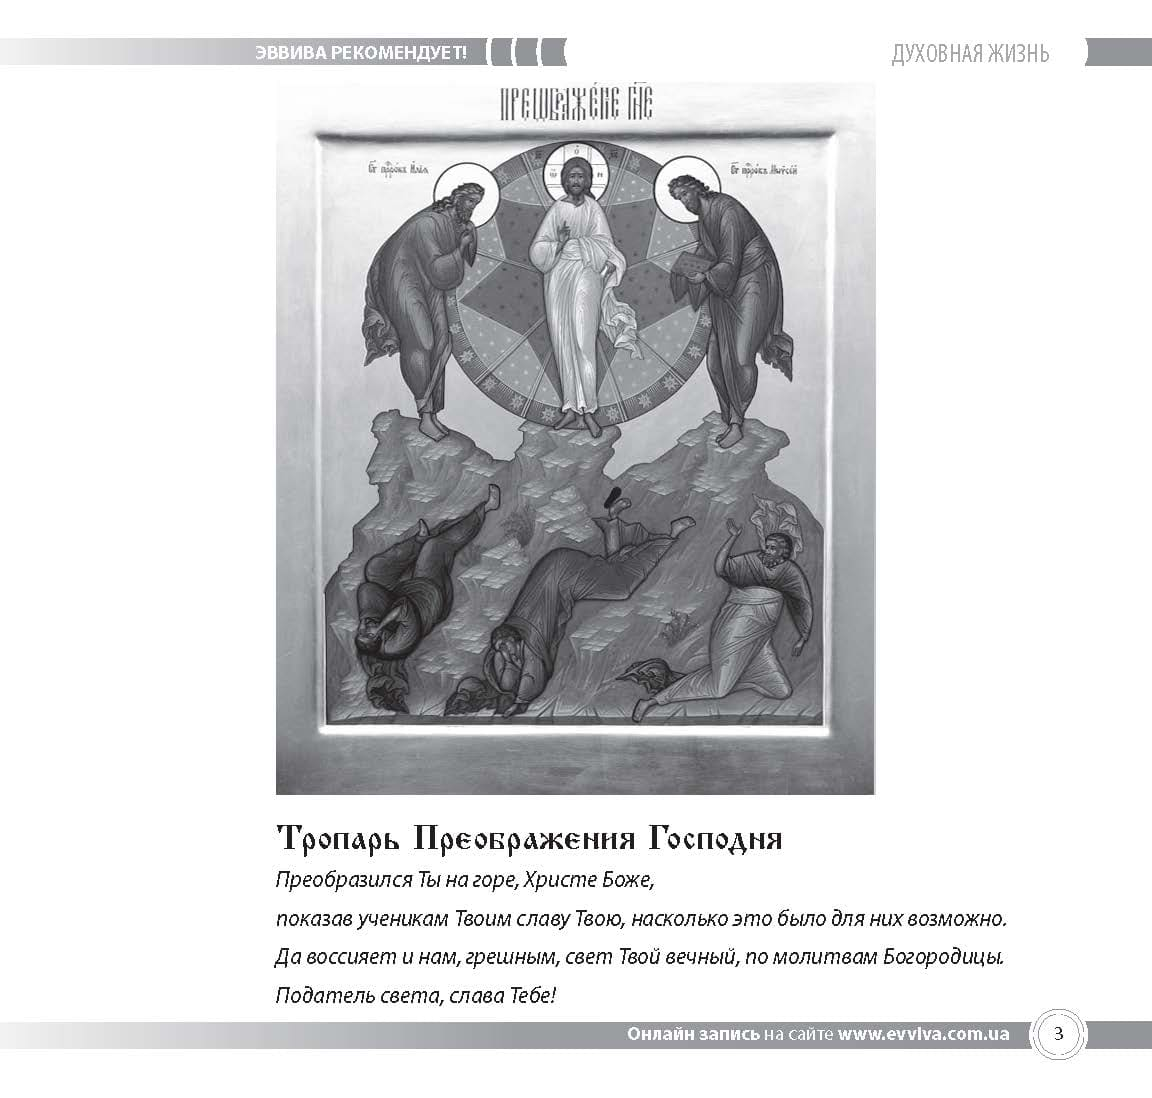 evviva-zhurnal-119-page3